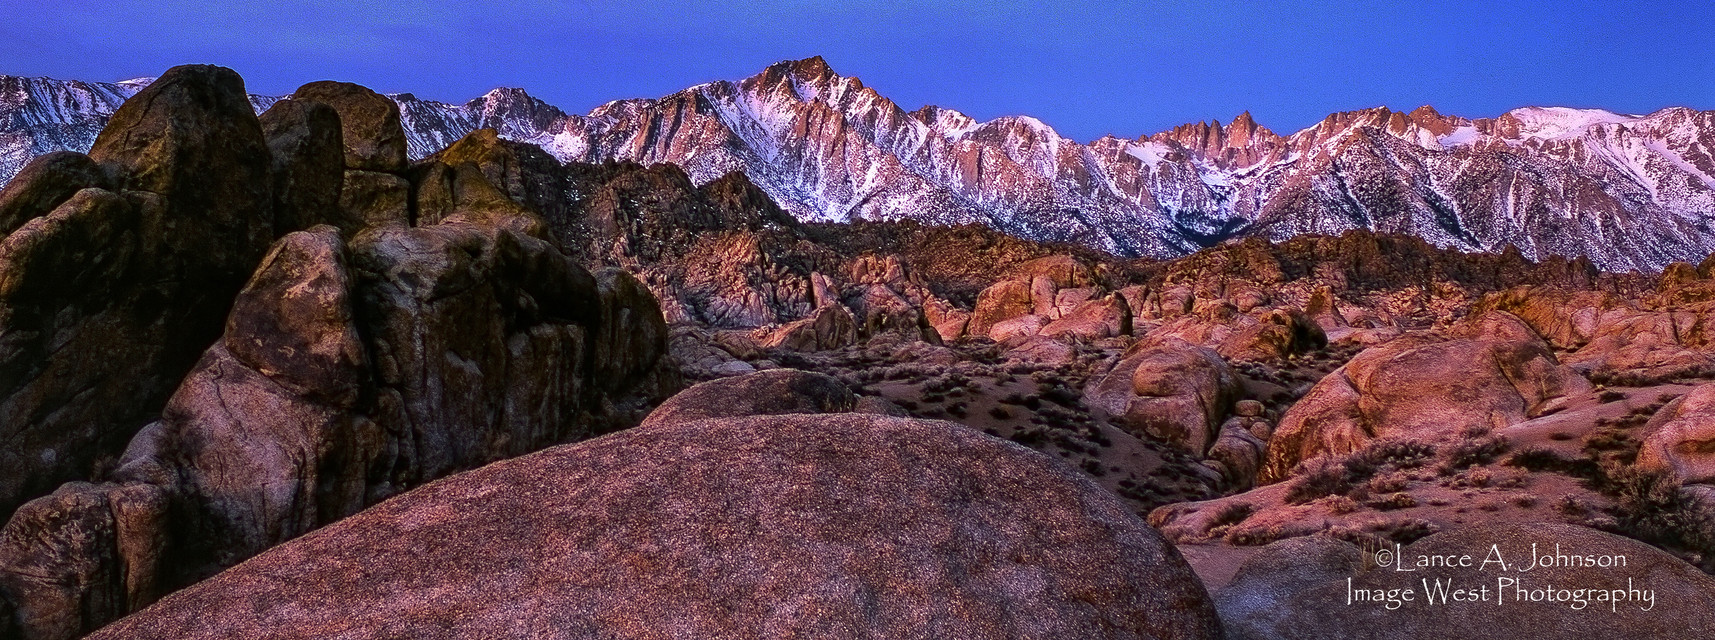 Sunrise with Lone Pine APeak and Mt. Whi